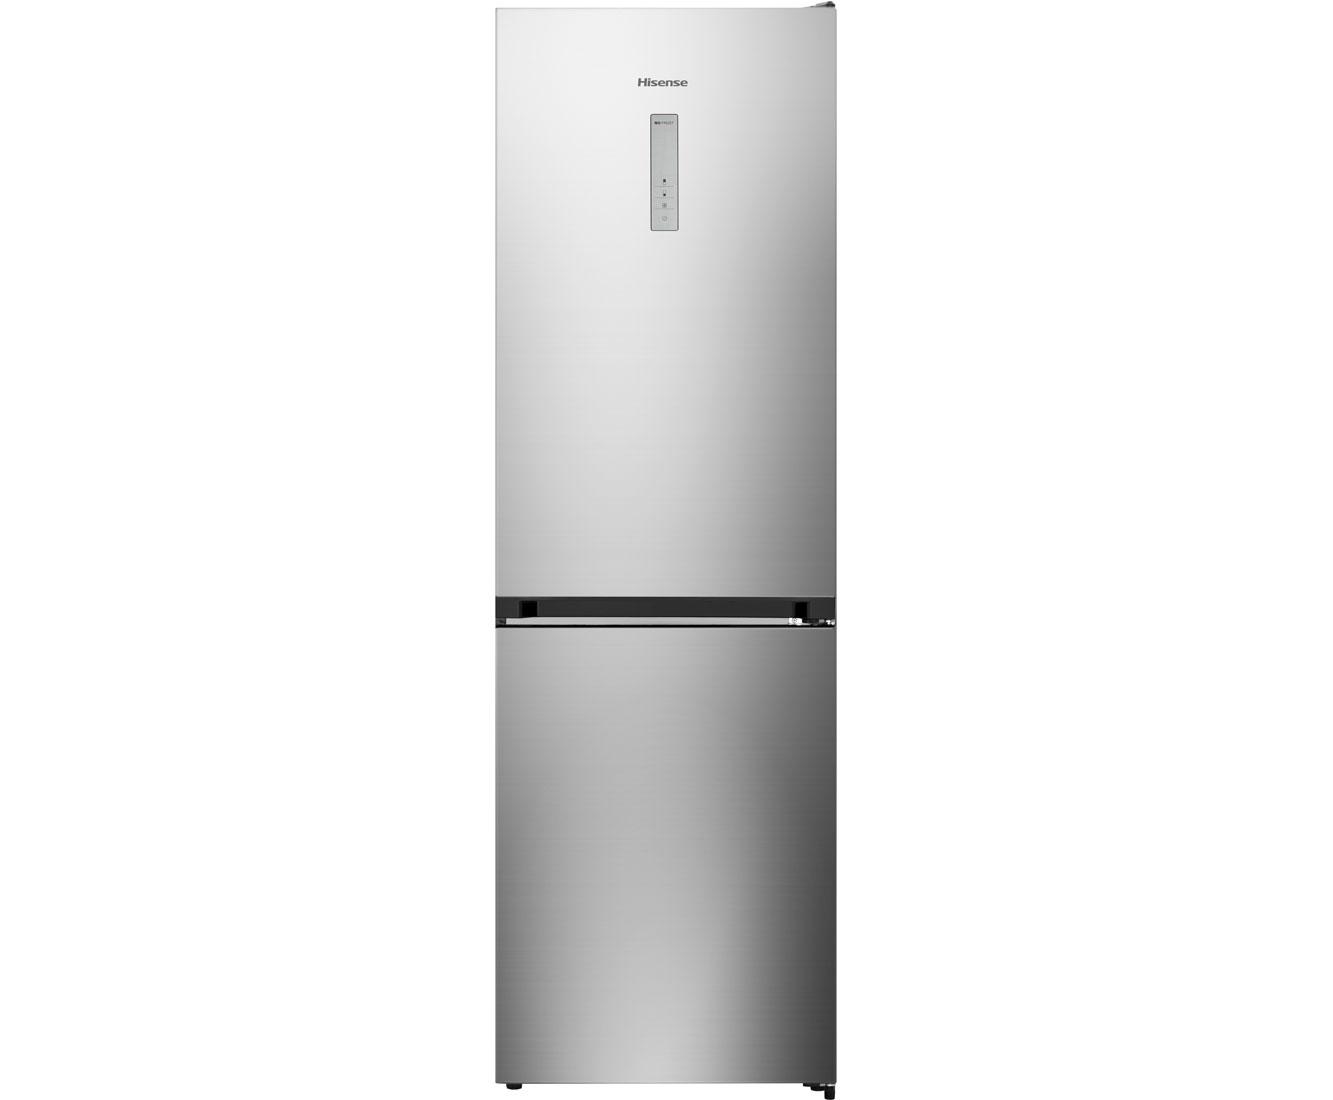 Amica Kühlschrank Expert : Hisense rb400n4bc3 kühl gefrierkombination mit no frost edelstahl